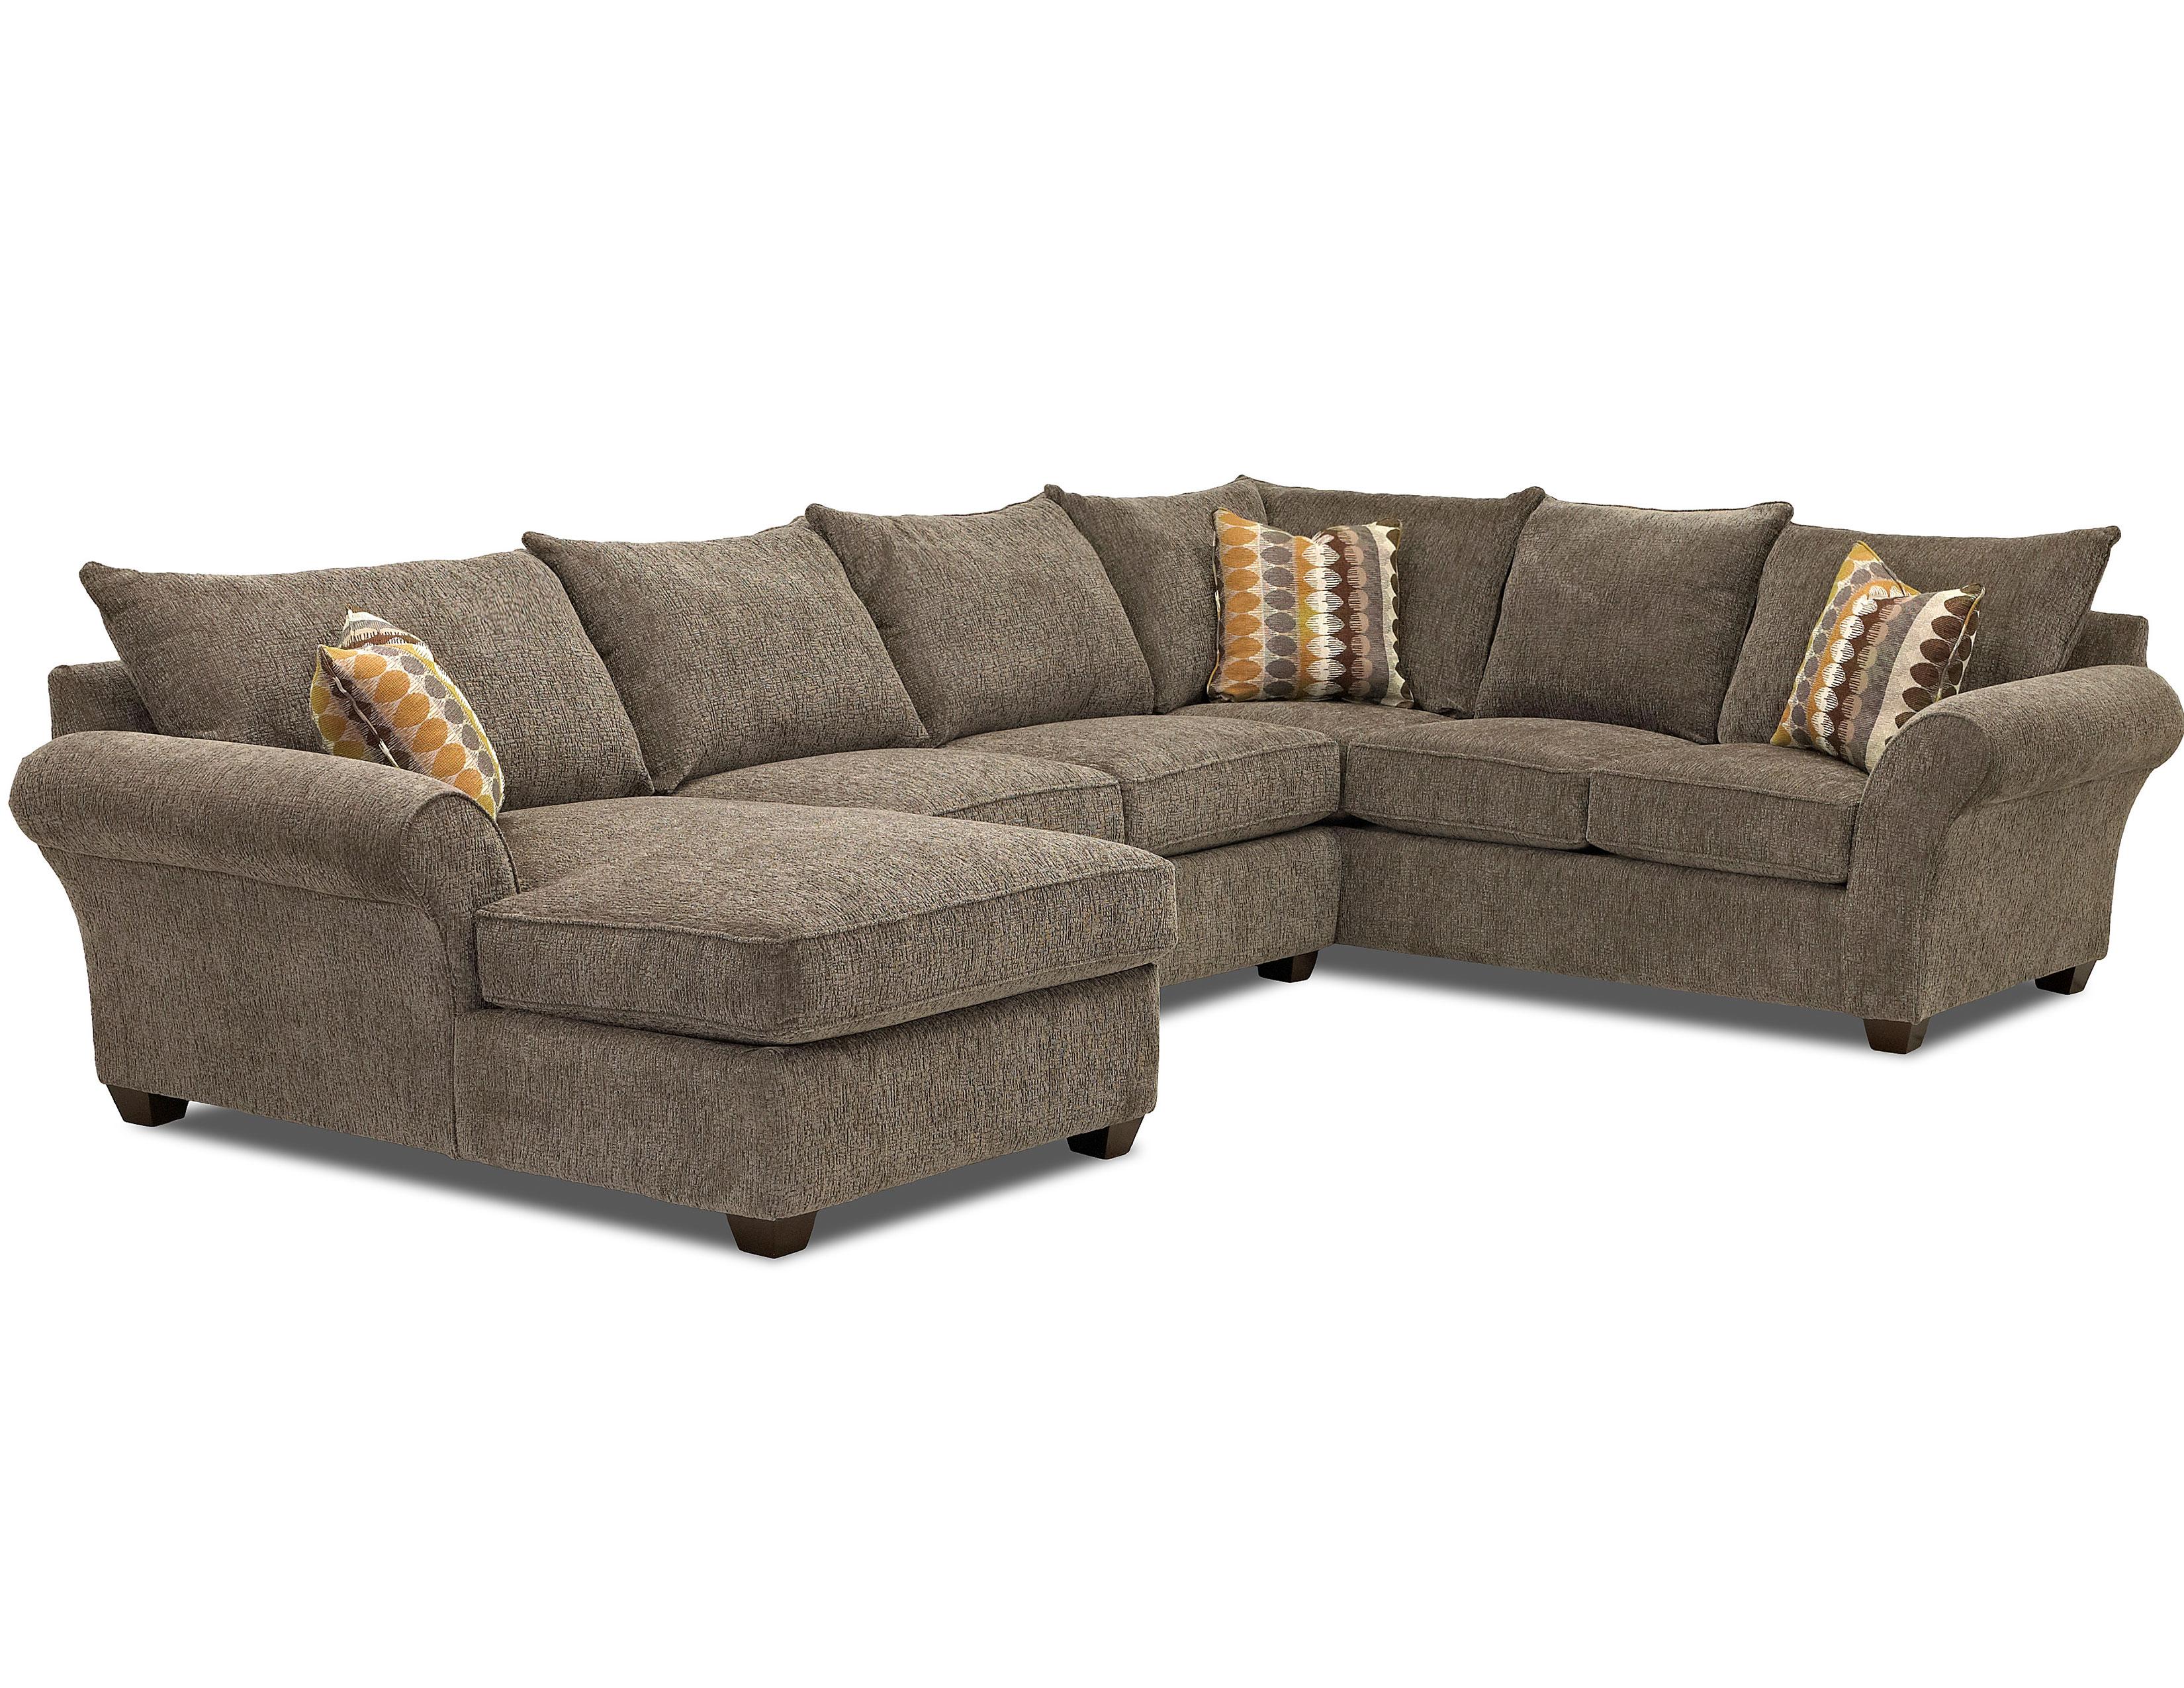 Groovy Fletcher 36600 Sectional Hundreds Of Fabrics Sofas And Creativecarmelina Interior Chair Design Creativecarmelinacom